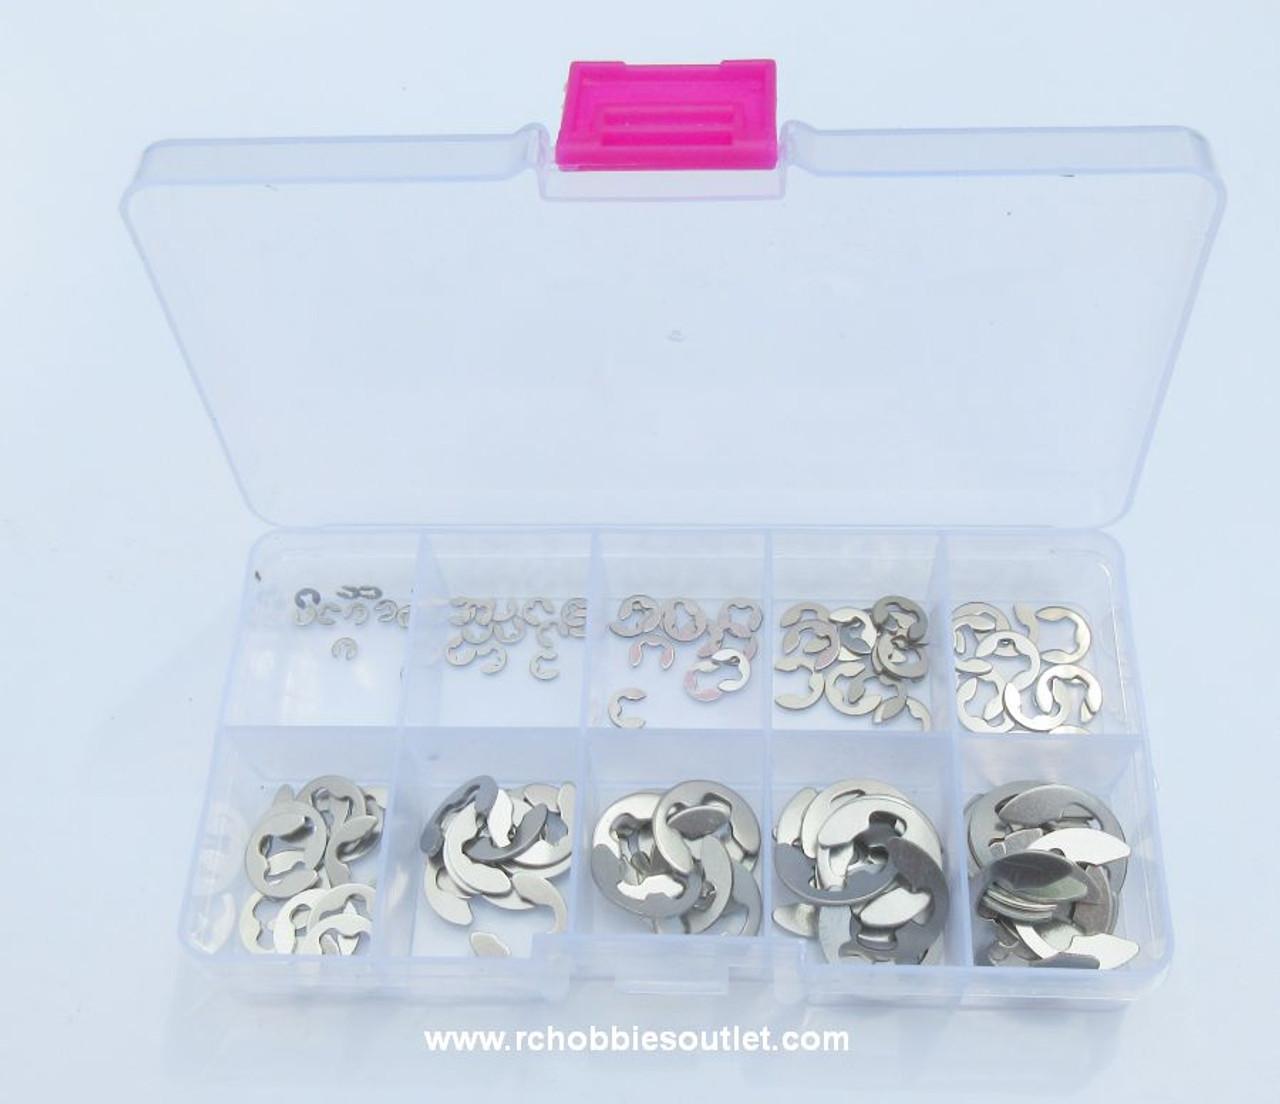 120 Piece Stainless Steel  E Clip  Assortment Kit